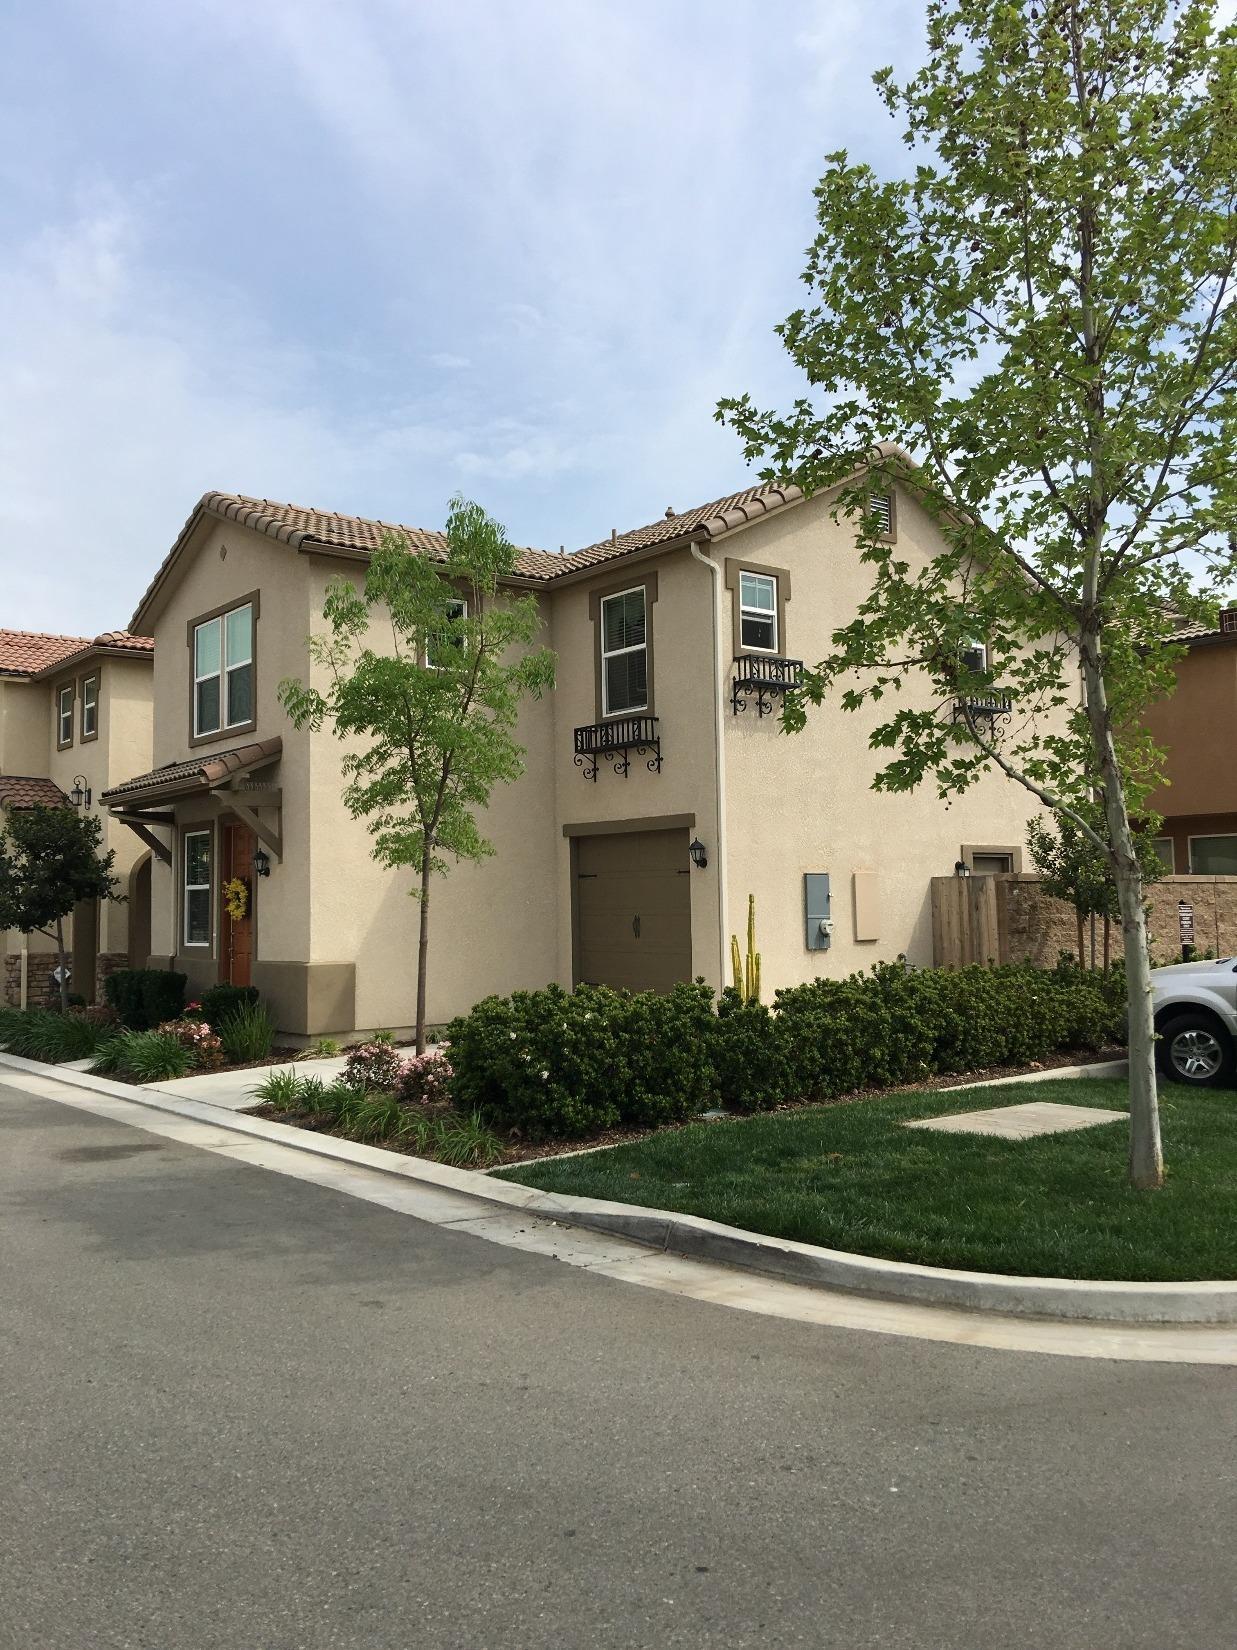 3610 Alcove Way, Clovis, CA